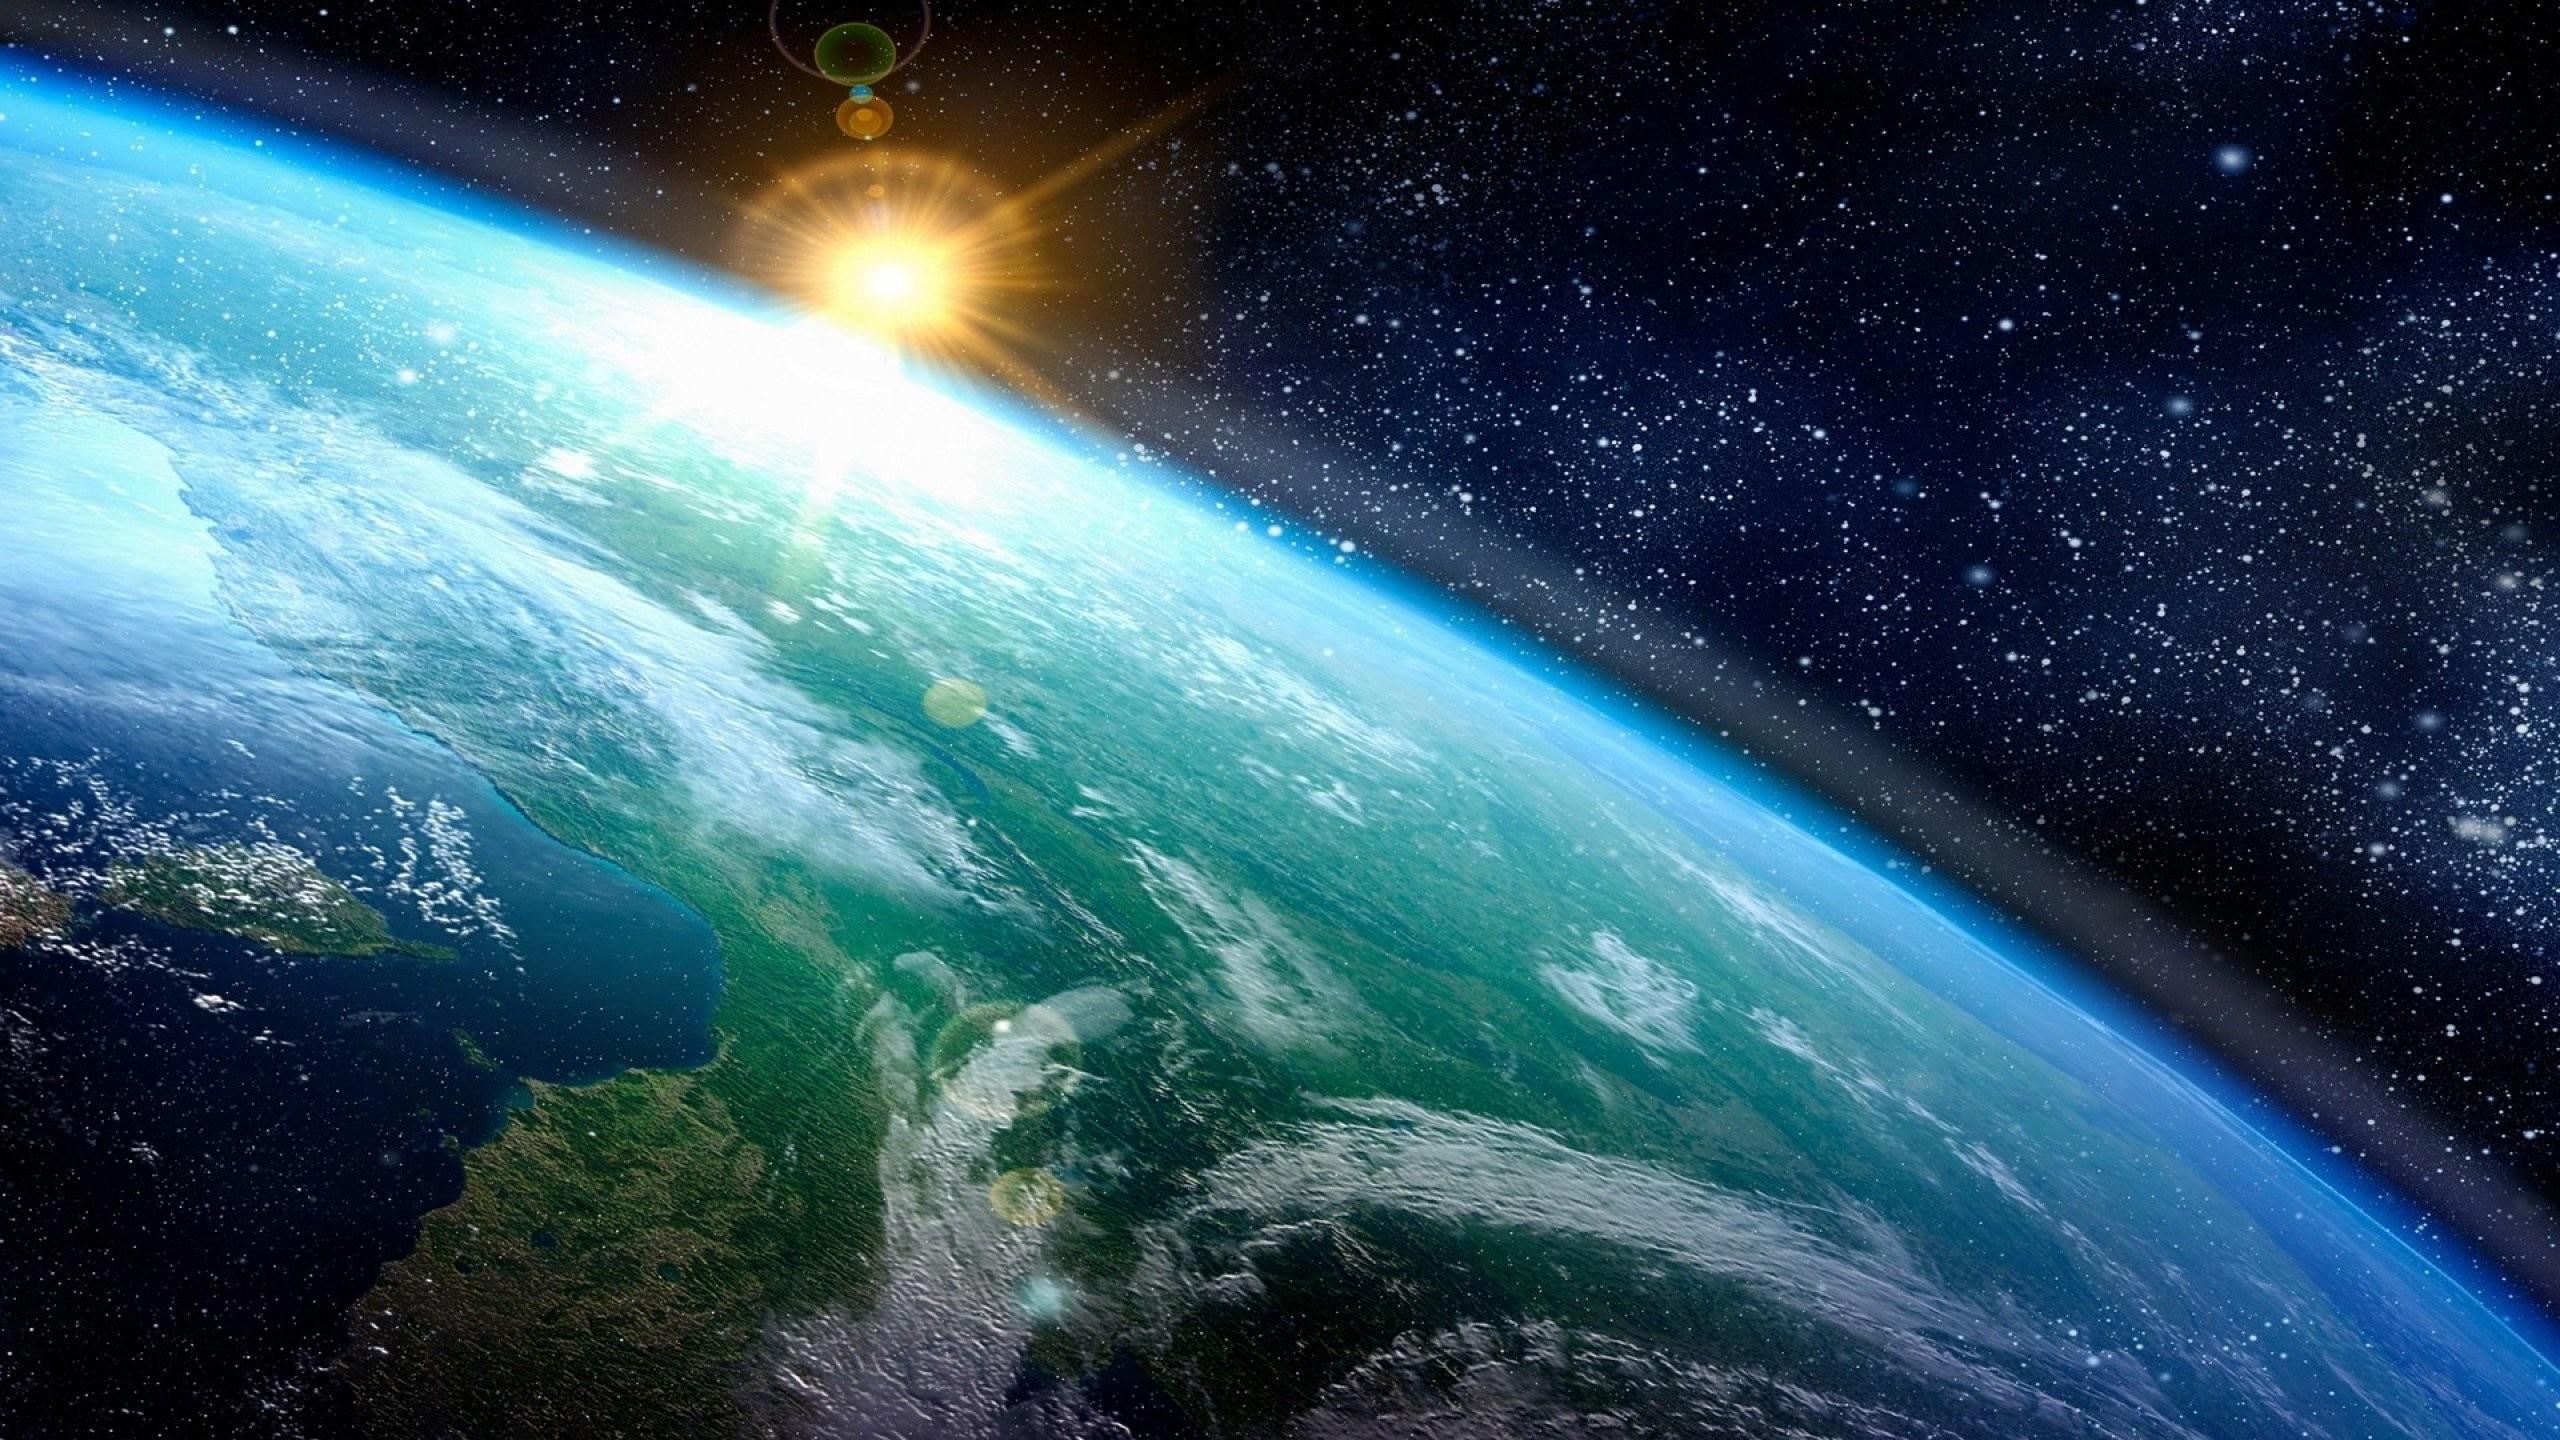 wallpaper.wiki-space-wallpaper-mobile-catalog-planet-sky-